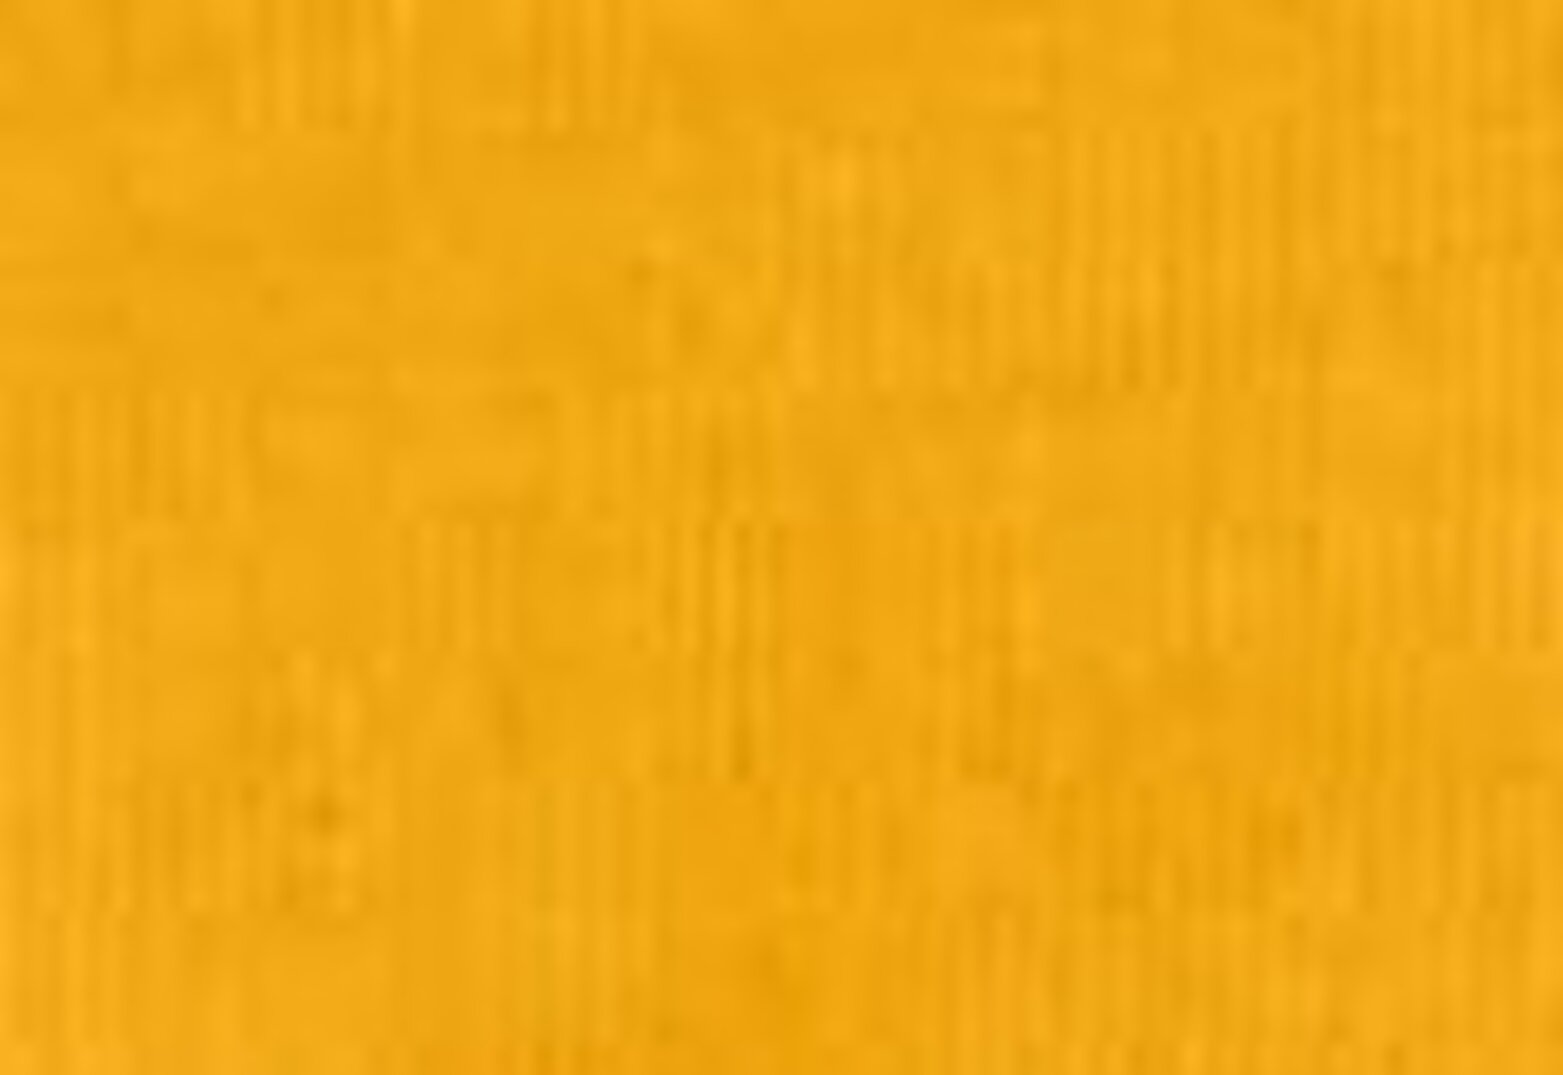 Ss Sunset Pocket Tee '20 Pocket Soccer Sarı/Turuncu Erkek Tişört